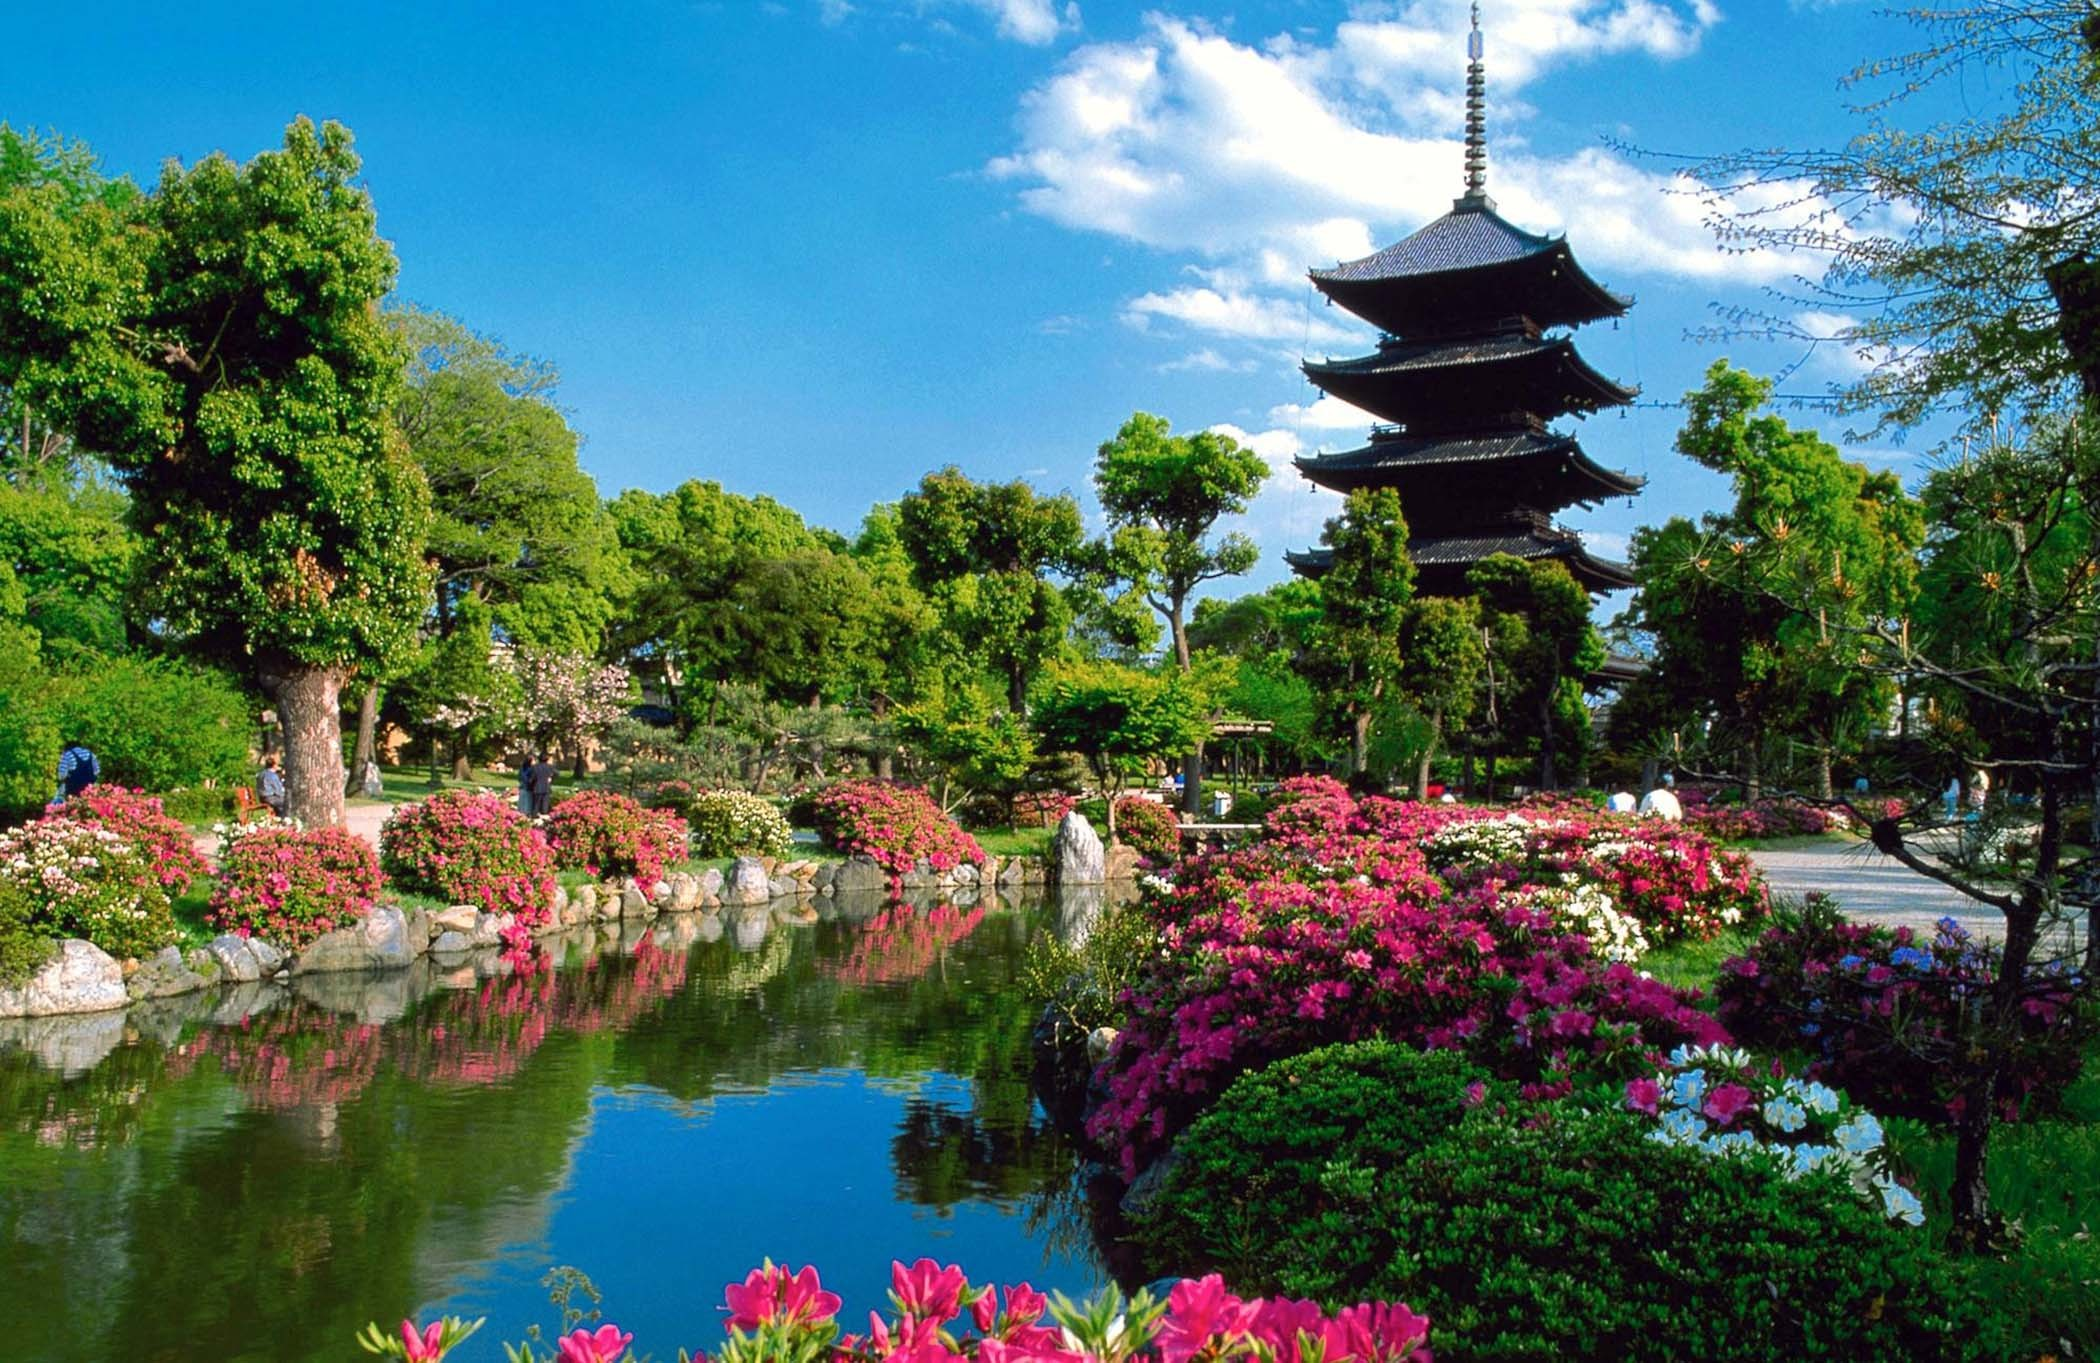 TagsJapan Natural Landscape Images Natural Places in Japan